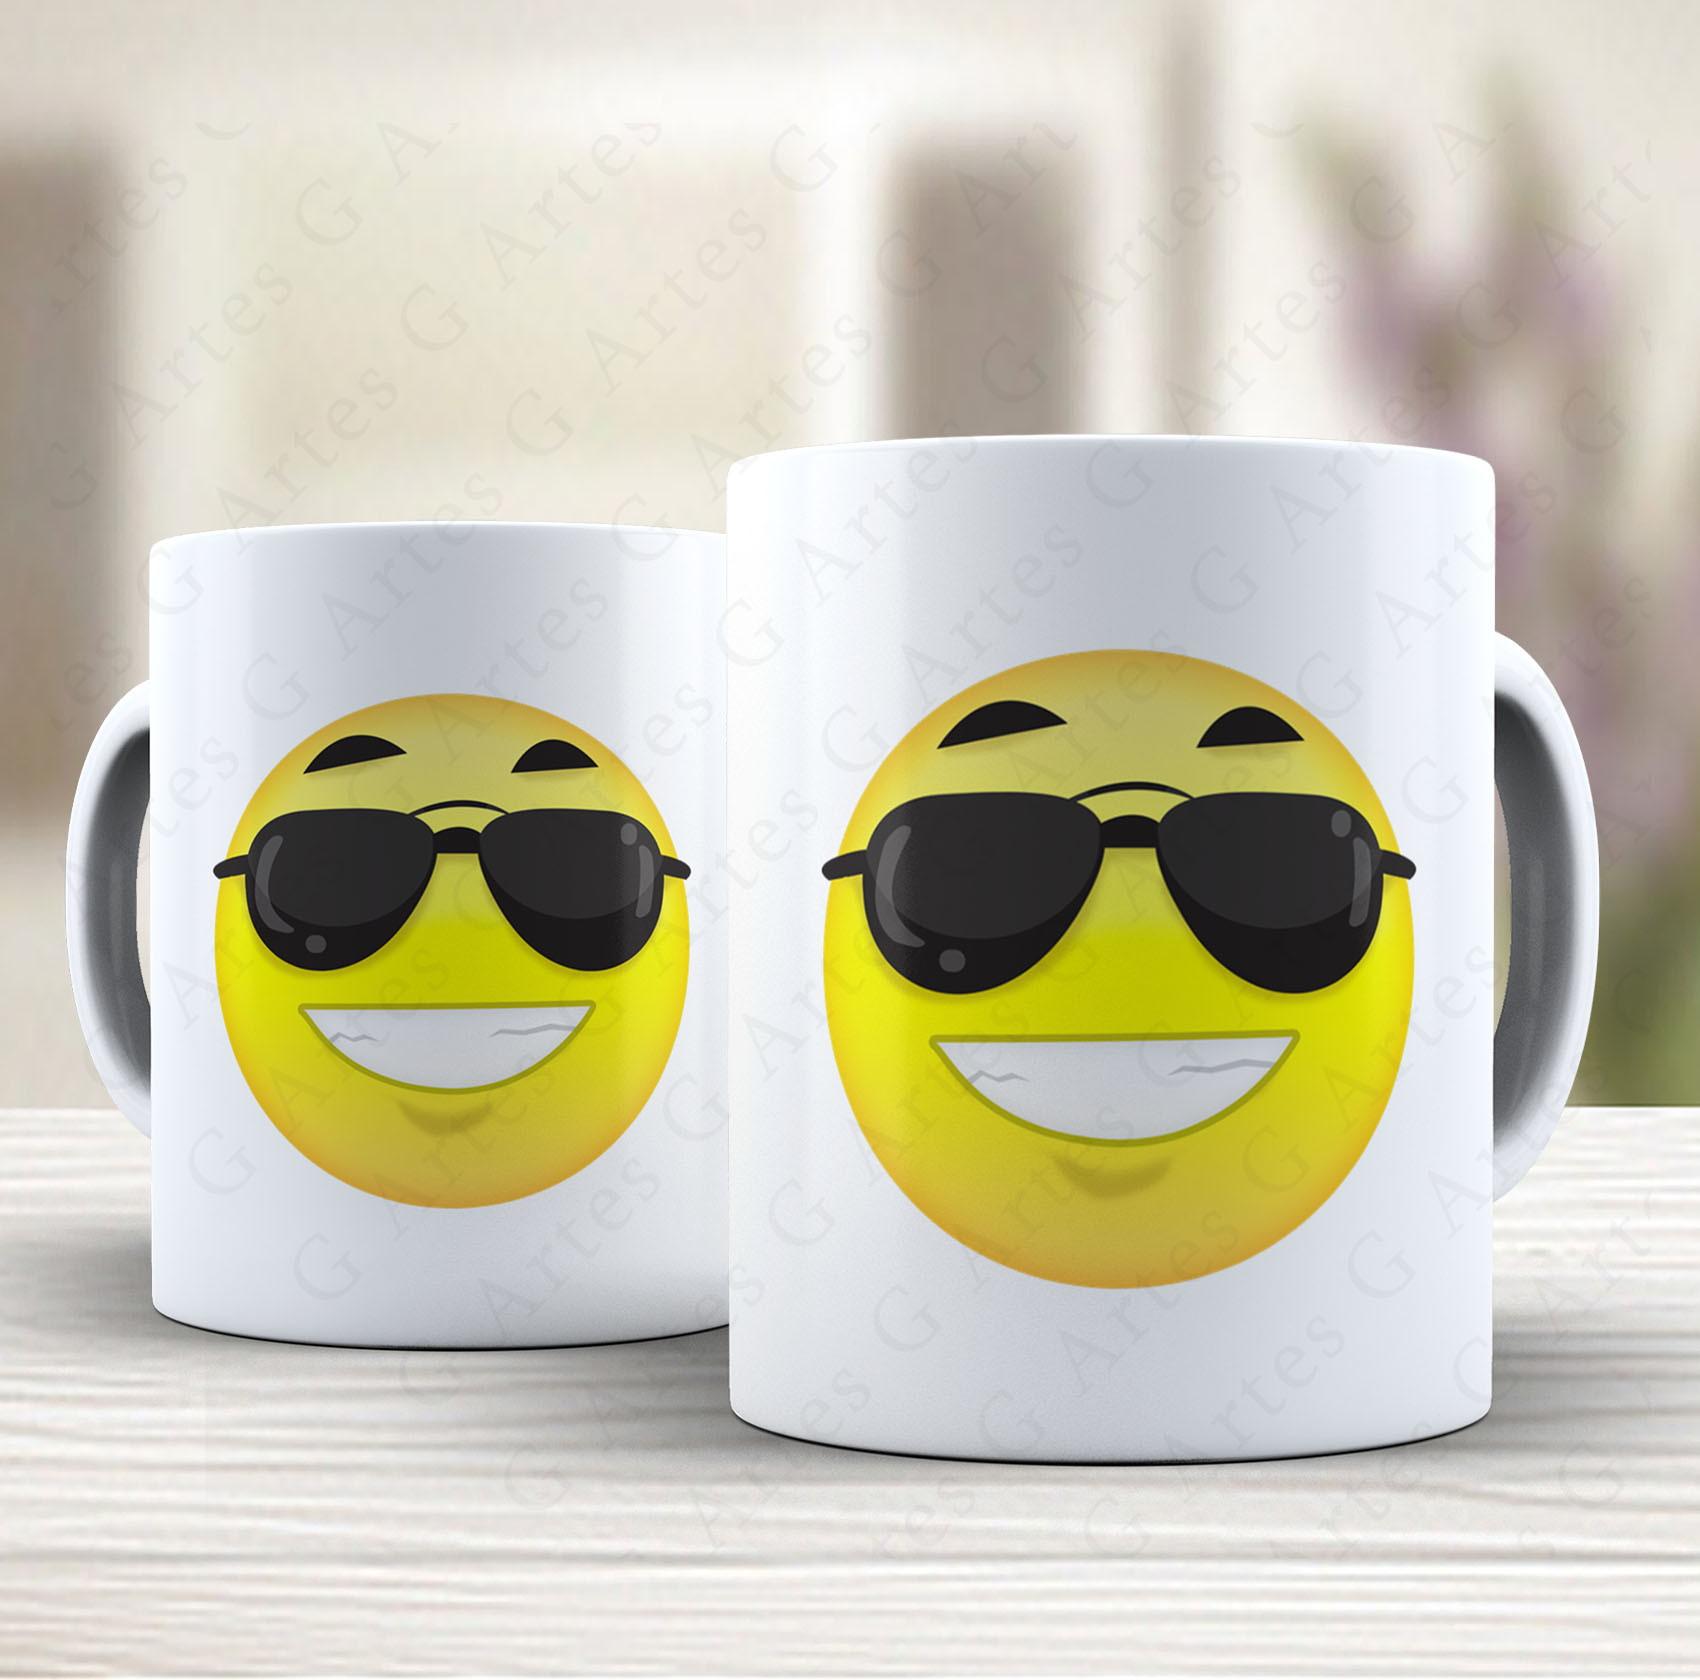 Chaveiro Emoji Oculos de Sol   Elo7 762383341d